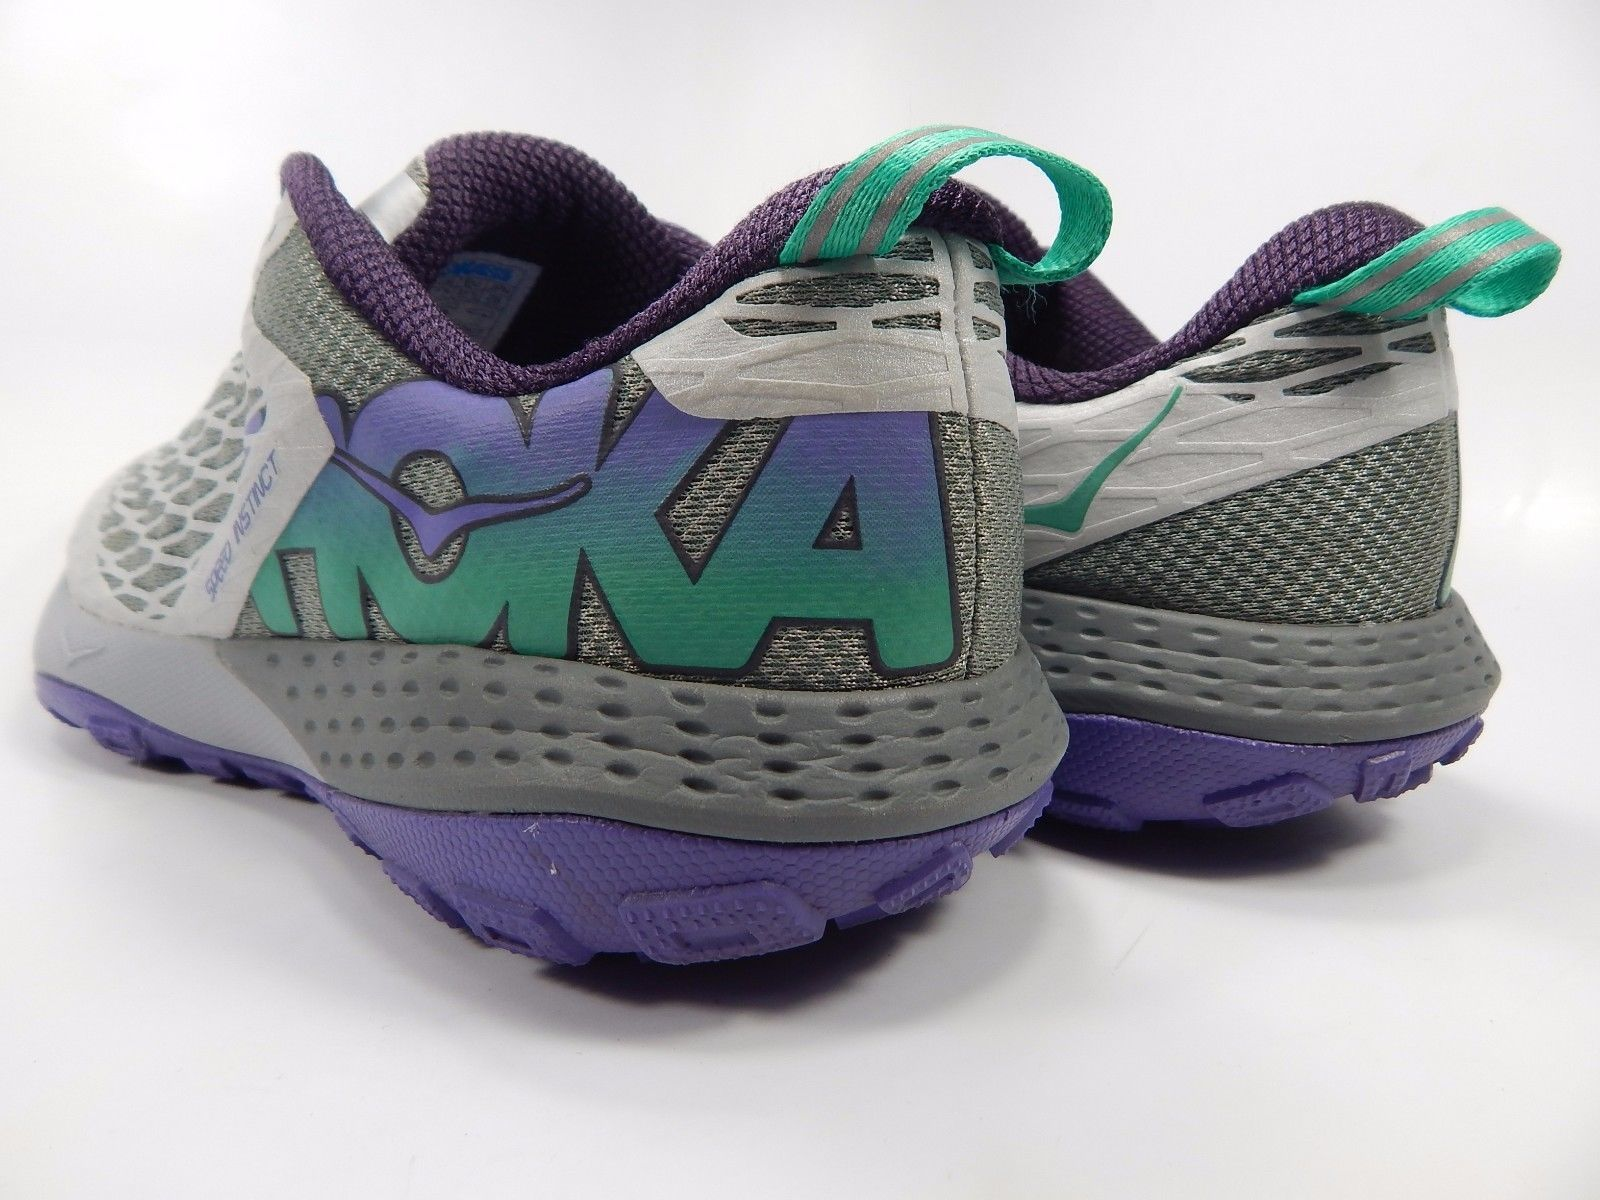 Hoka One One Speed Instinct Women's Trail Running Shoes Sz US 9 M (B) EU 41 1/3